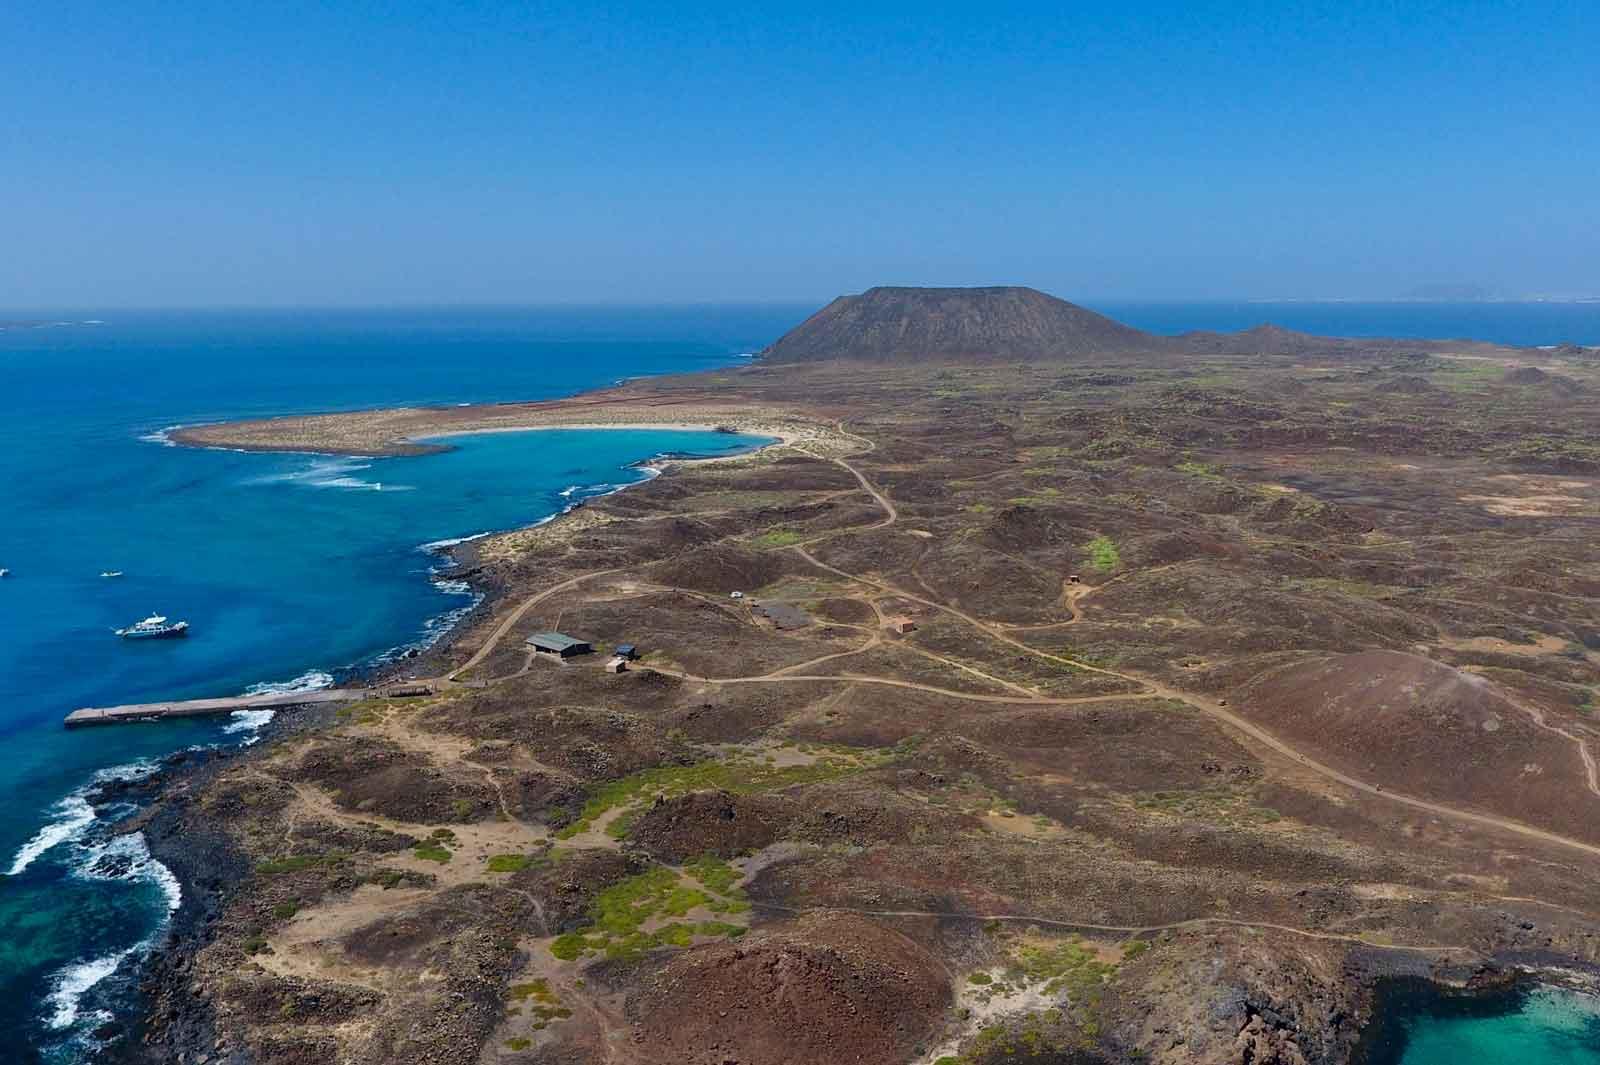 Foto aerea de Isla de Lobos de JP